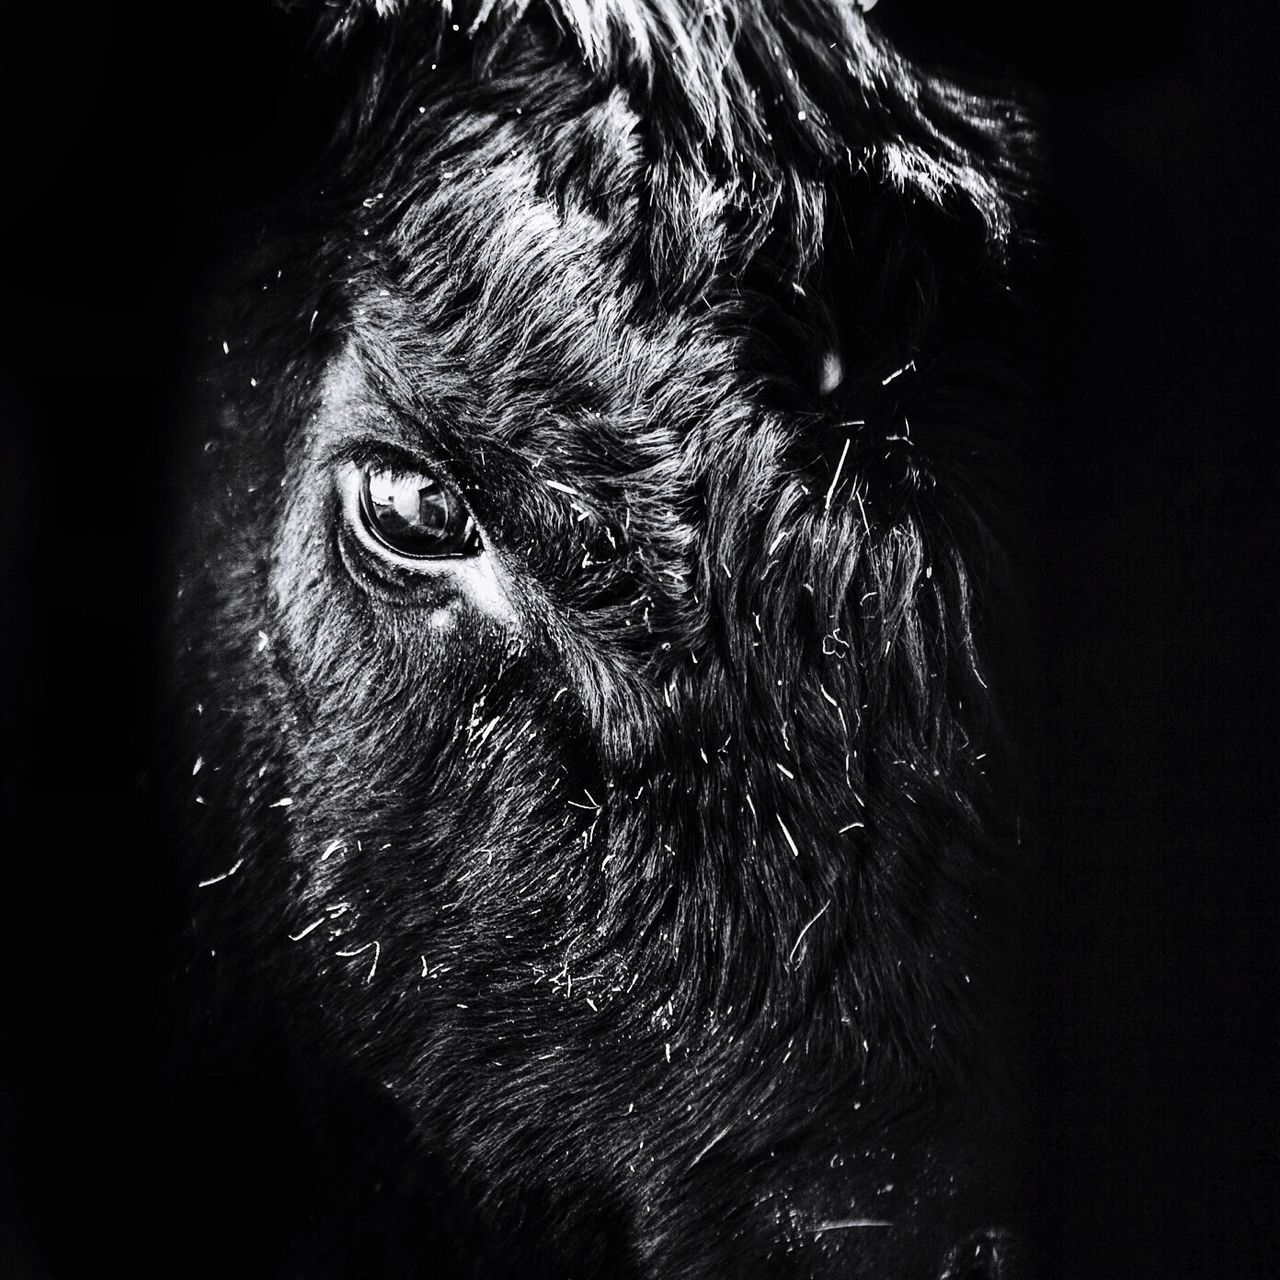 Blackandwhite Black Angus Cows Animals